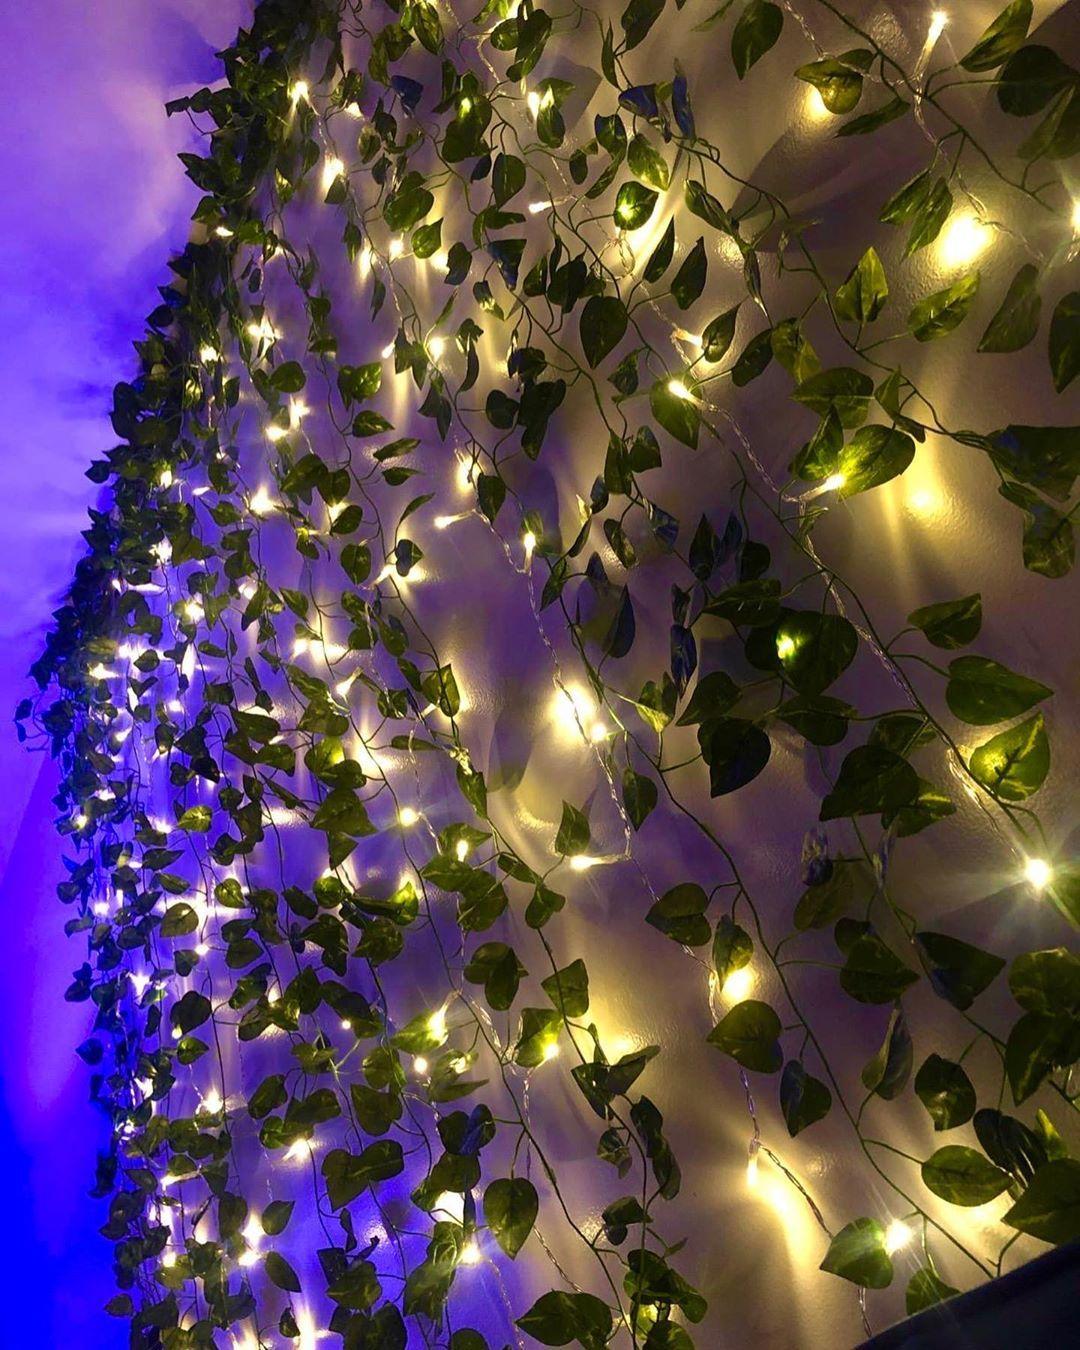 Led Wall Vine Lights In 2020 Led Lighting Bedroom Fairy Lights Bedroom Aesthetic Room Decor